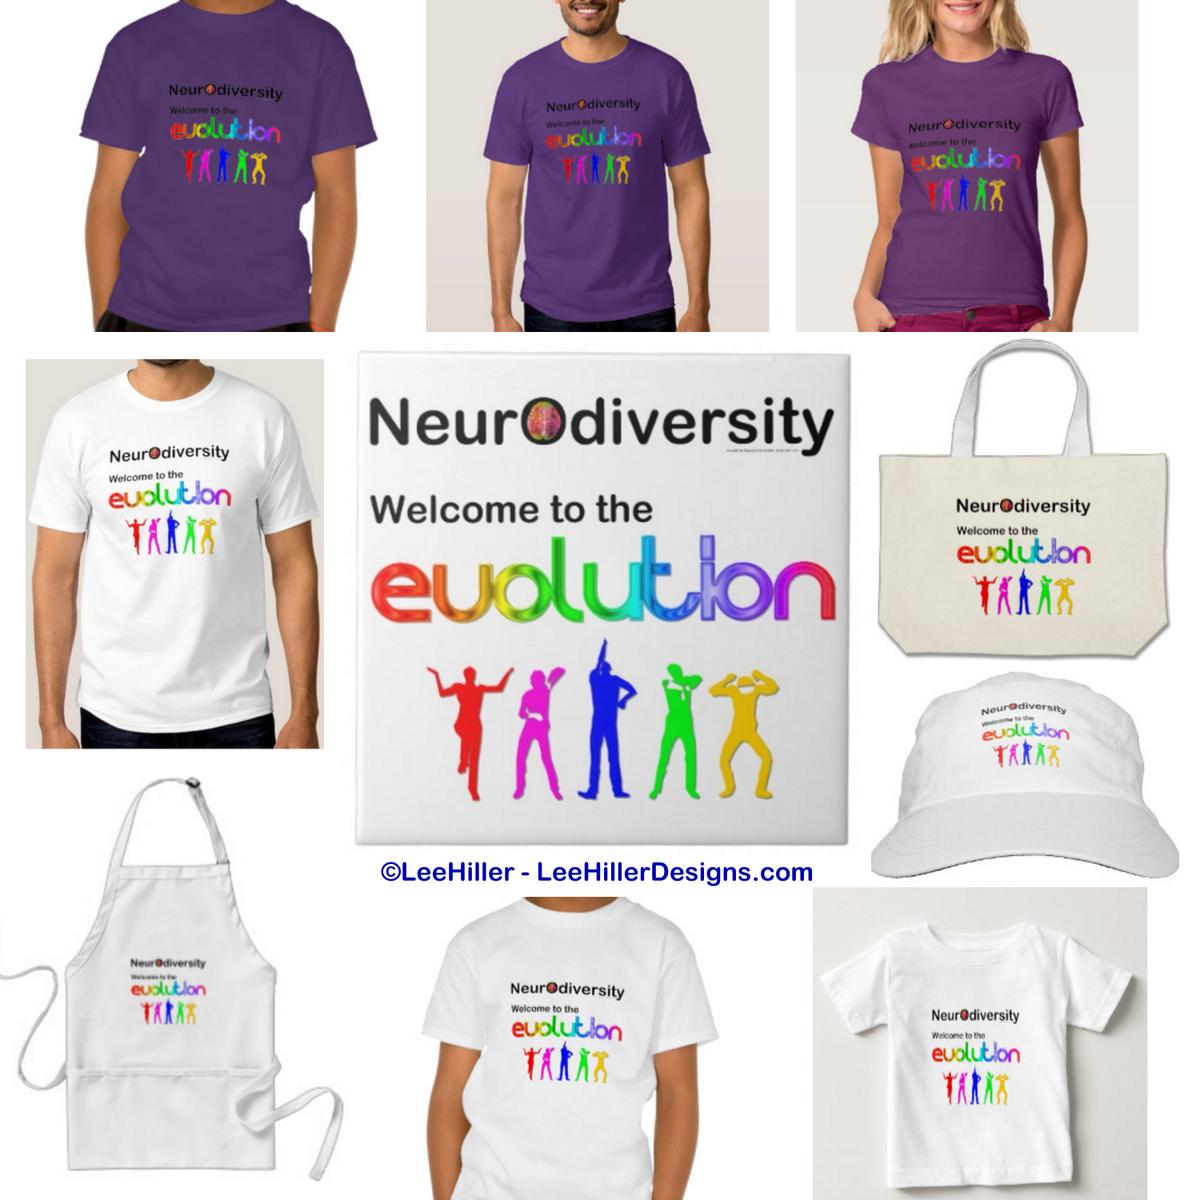 #Neurodiversity Welcome to the #Evolution #Autistic #Aspergers #Autism #TShirt #Apparel  http://bitly.com/NeurodiversityZ1…